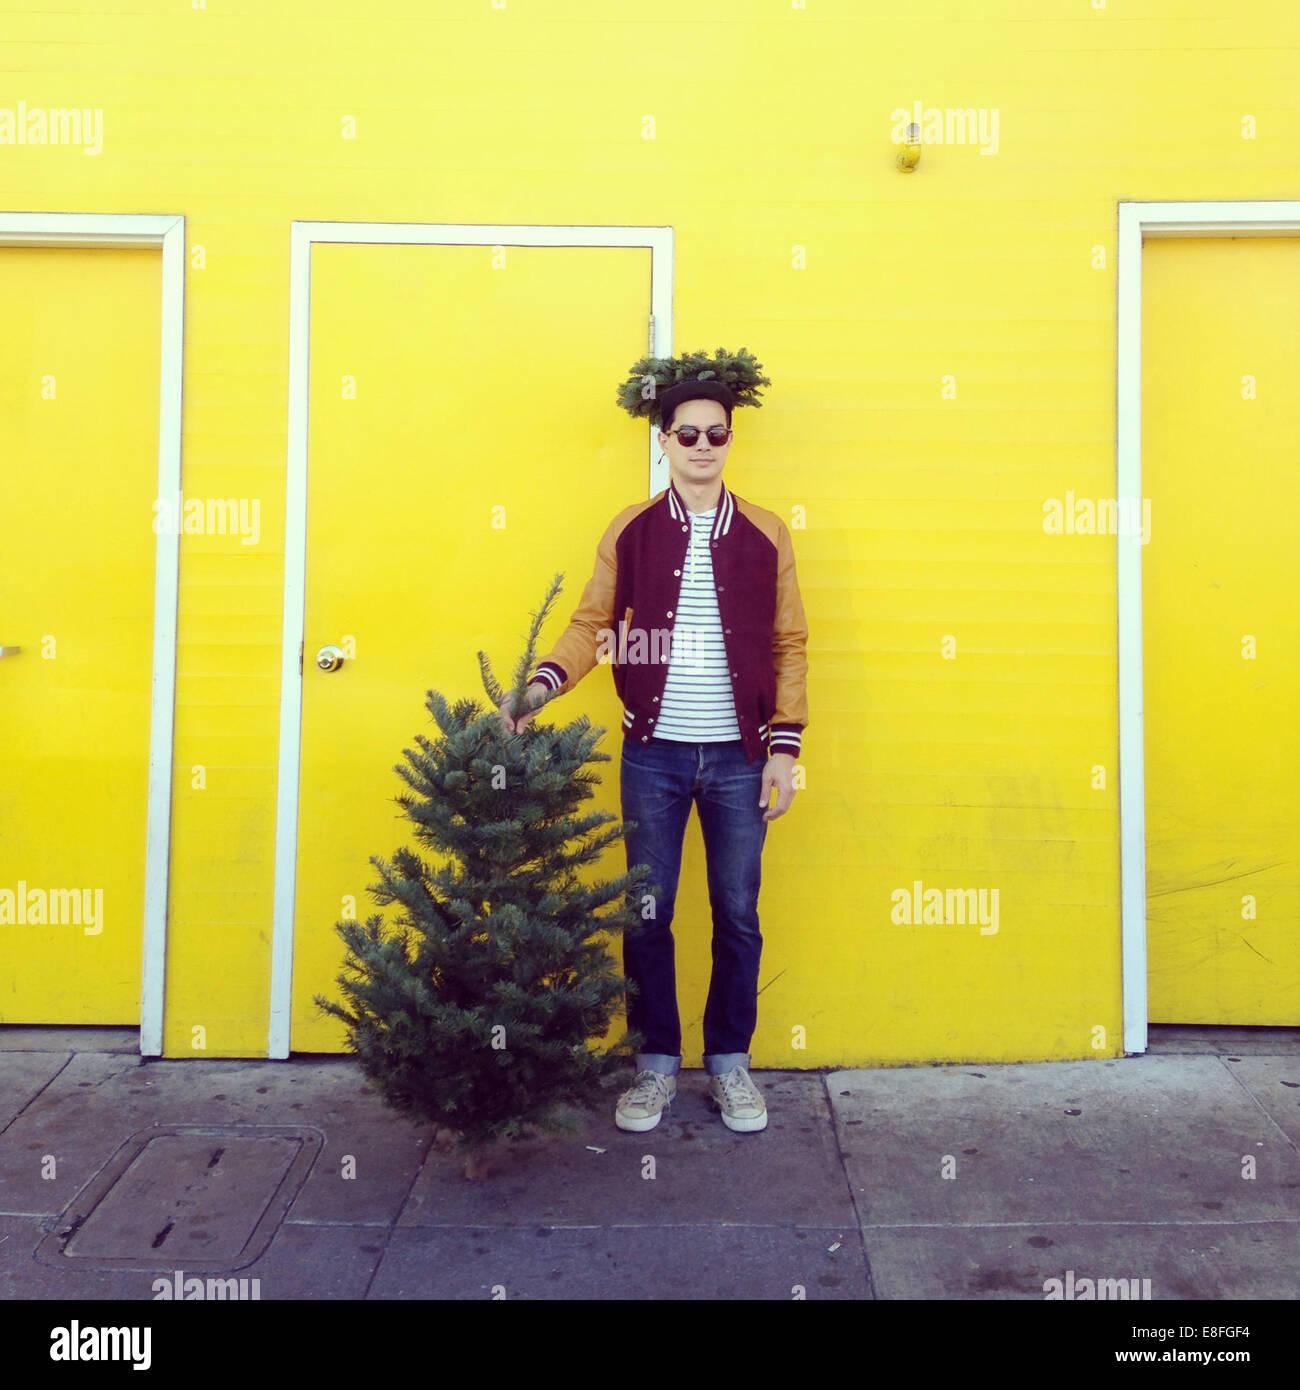 Man with a Christmas tree - Stock Image